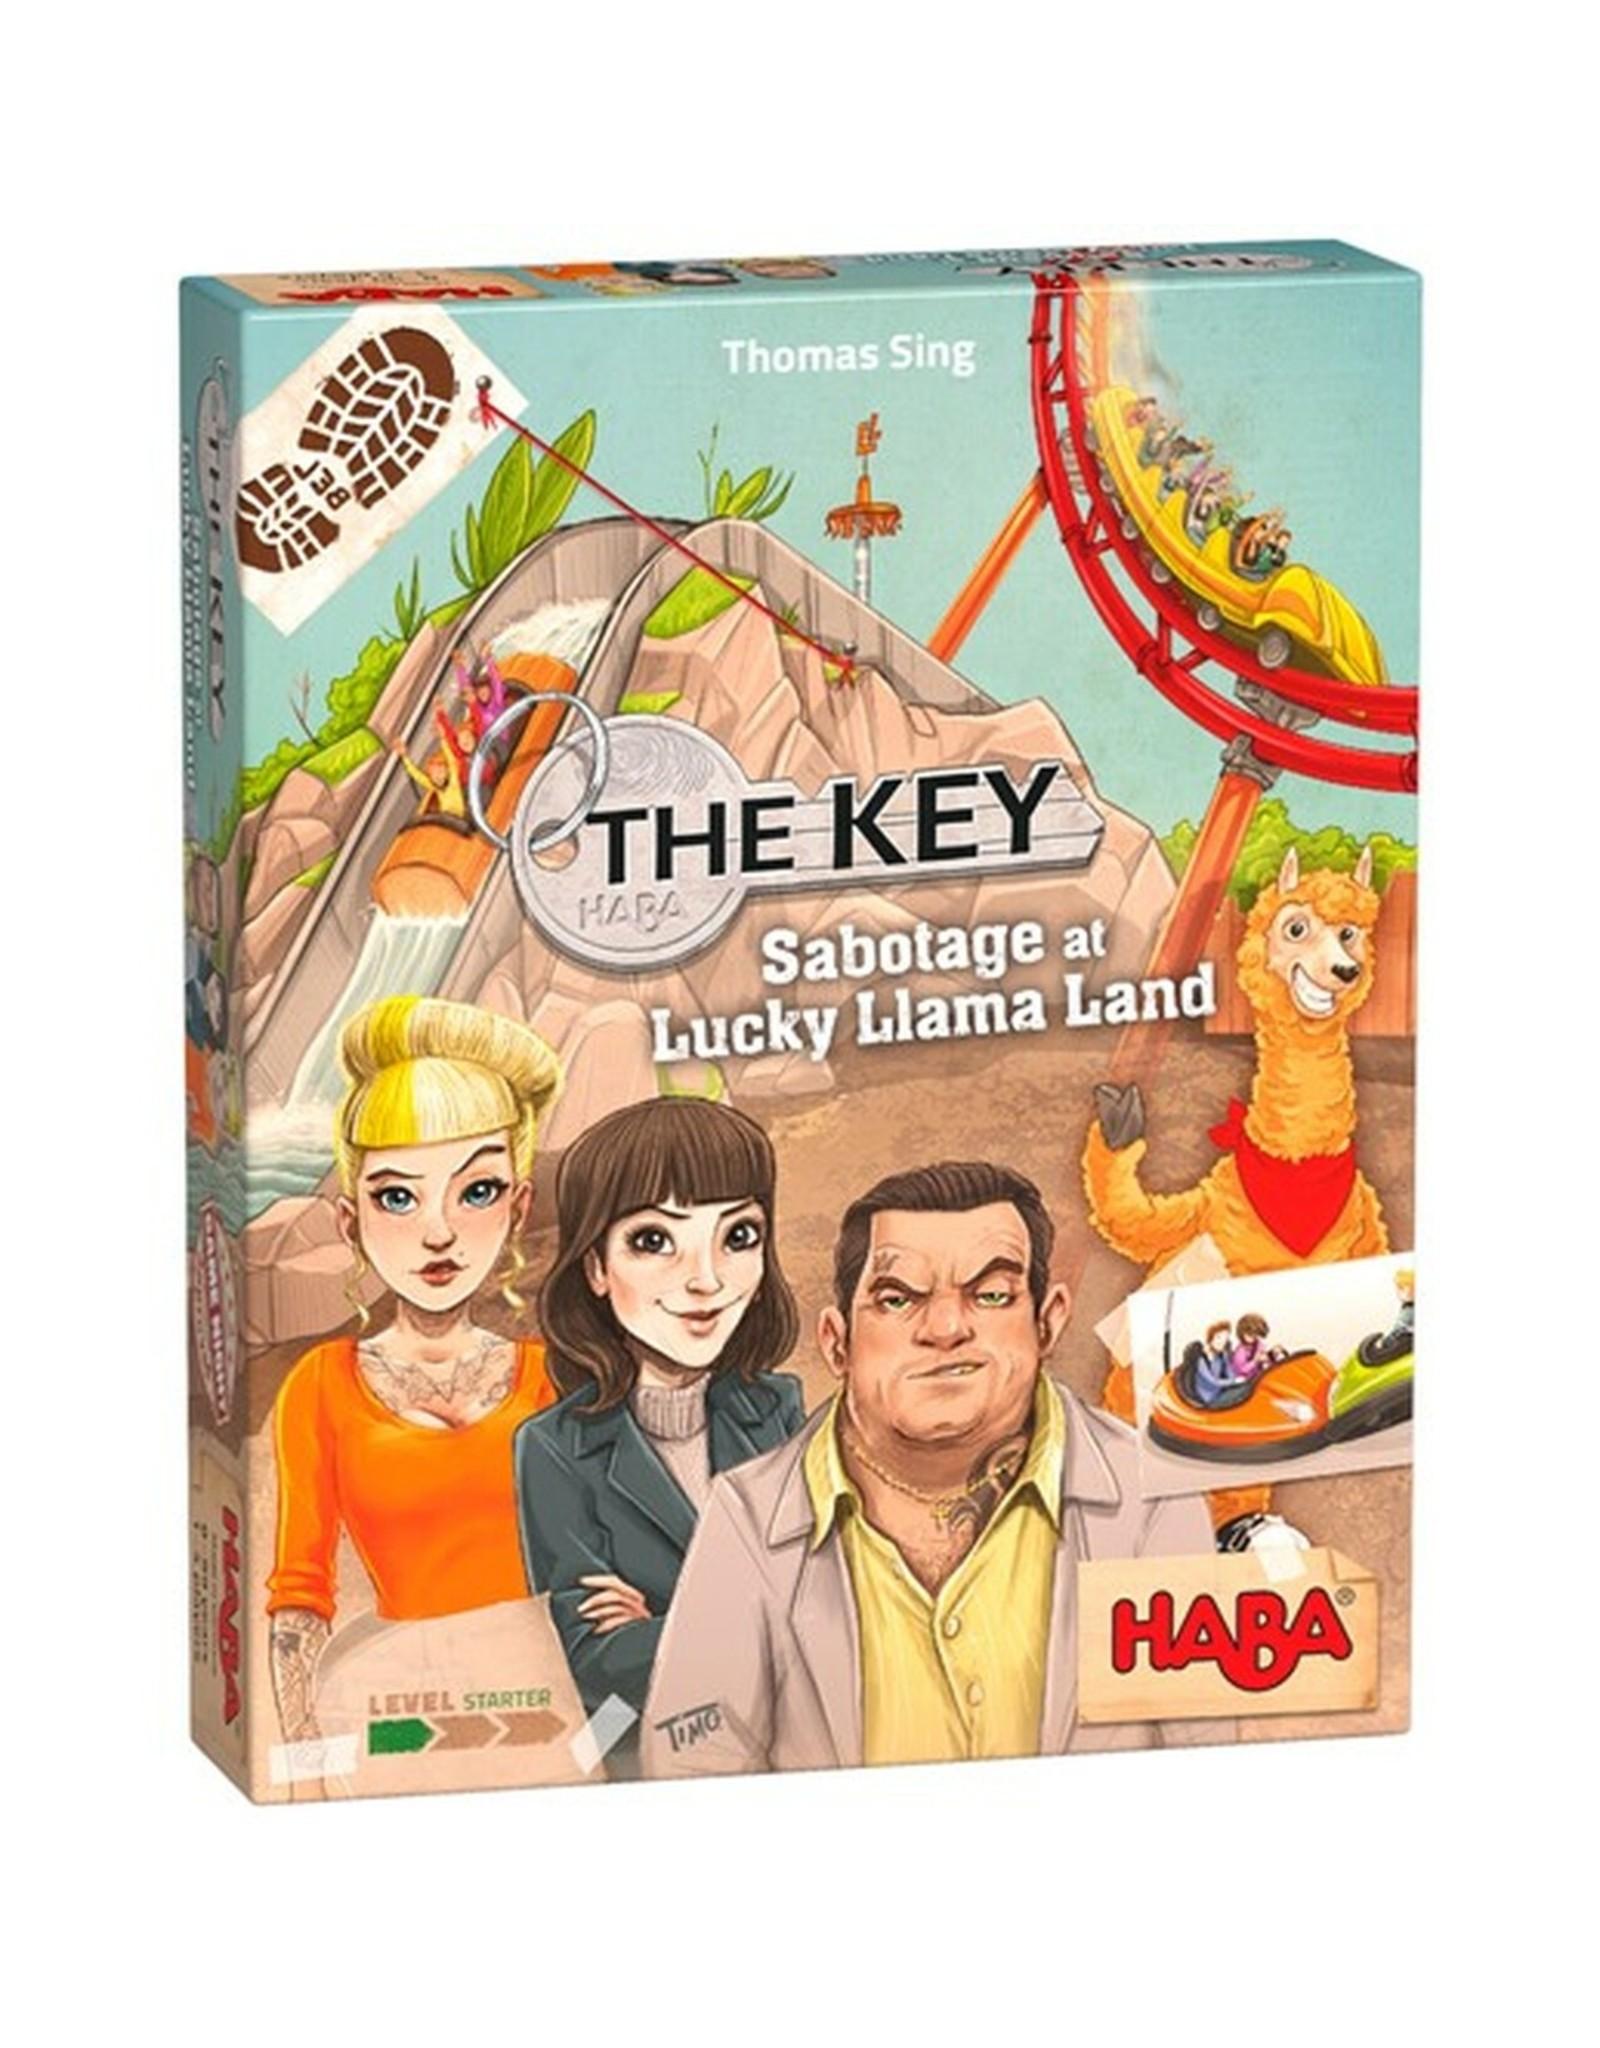 Haba USA The Key: Sabotage at Lucky Llama Land